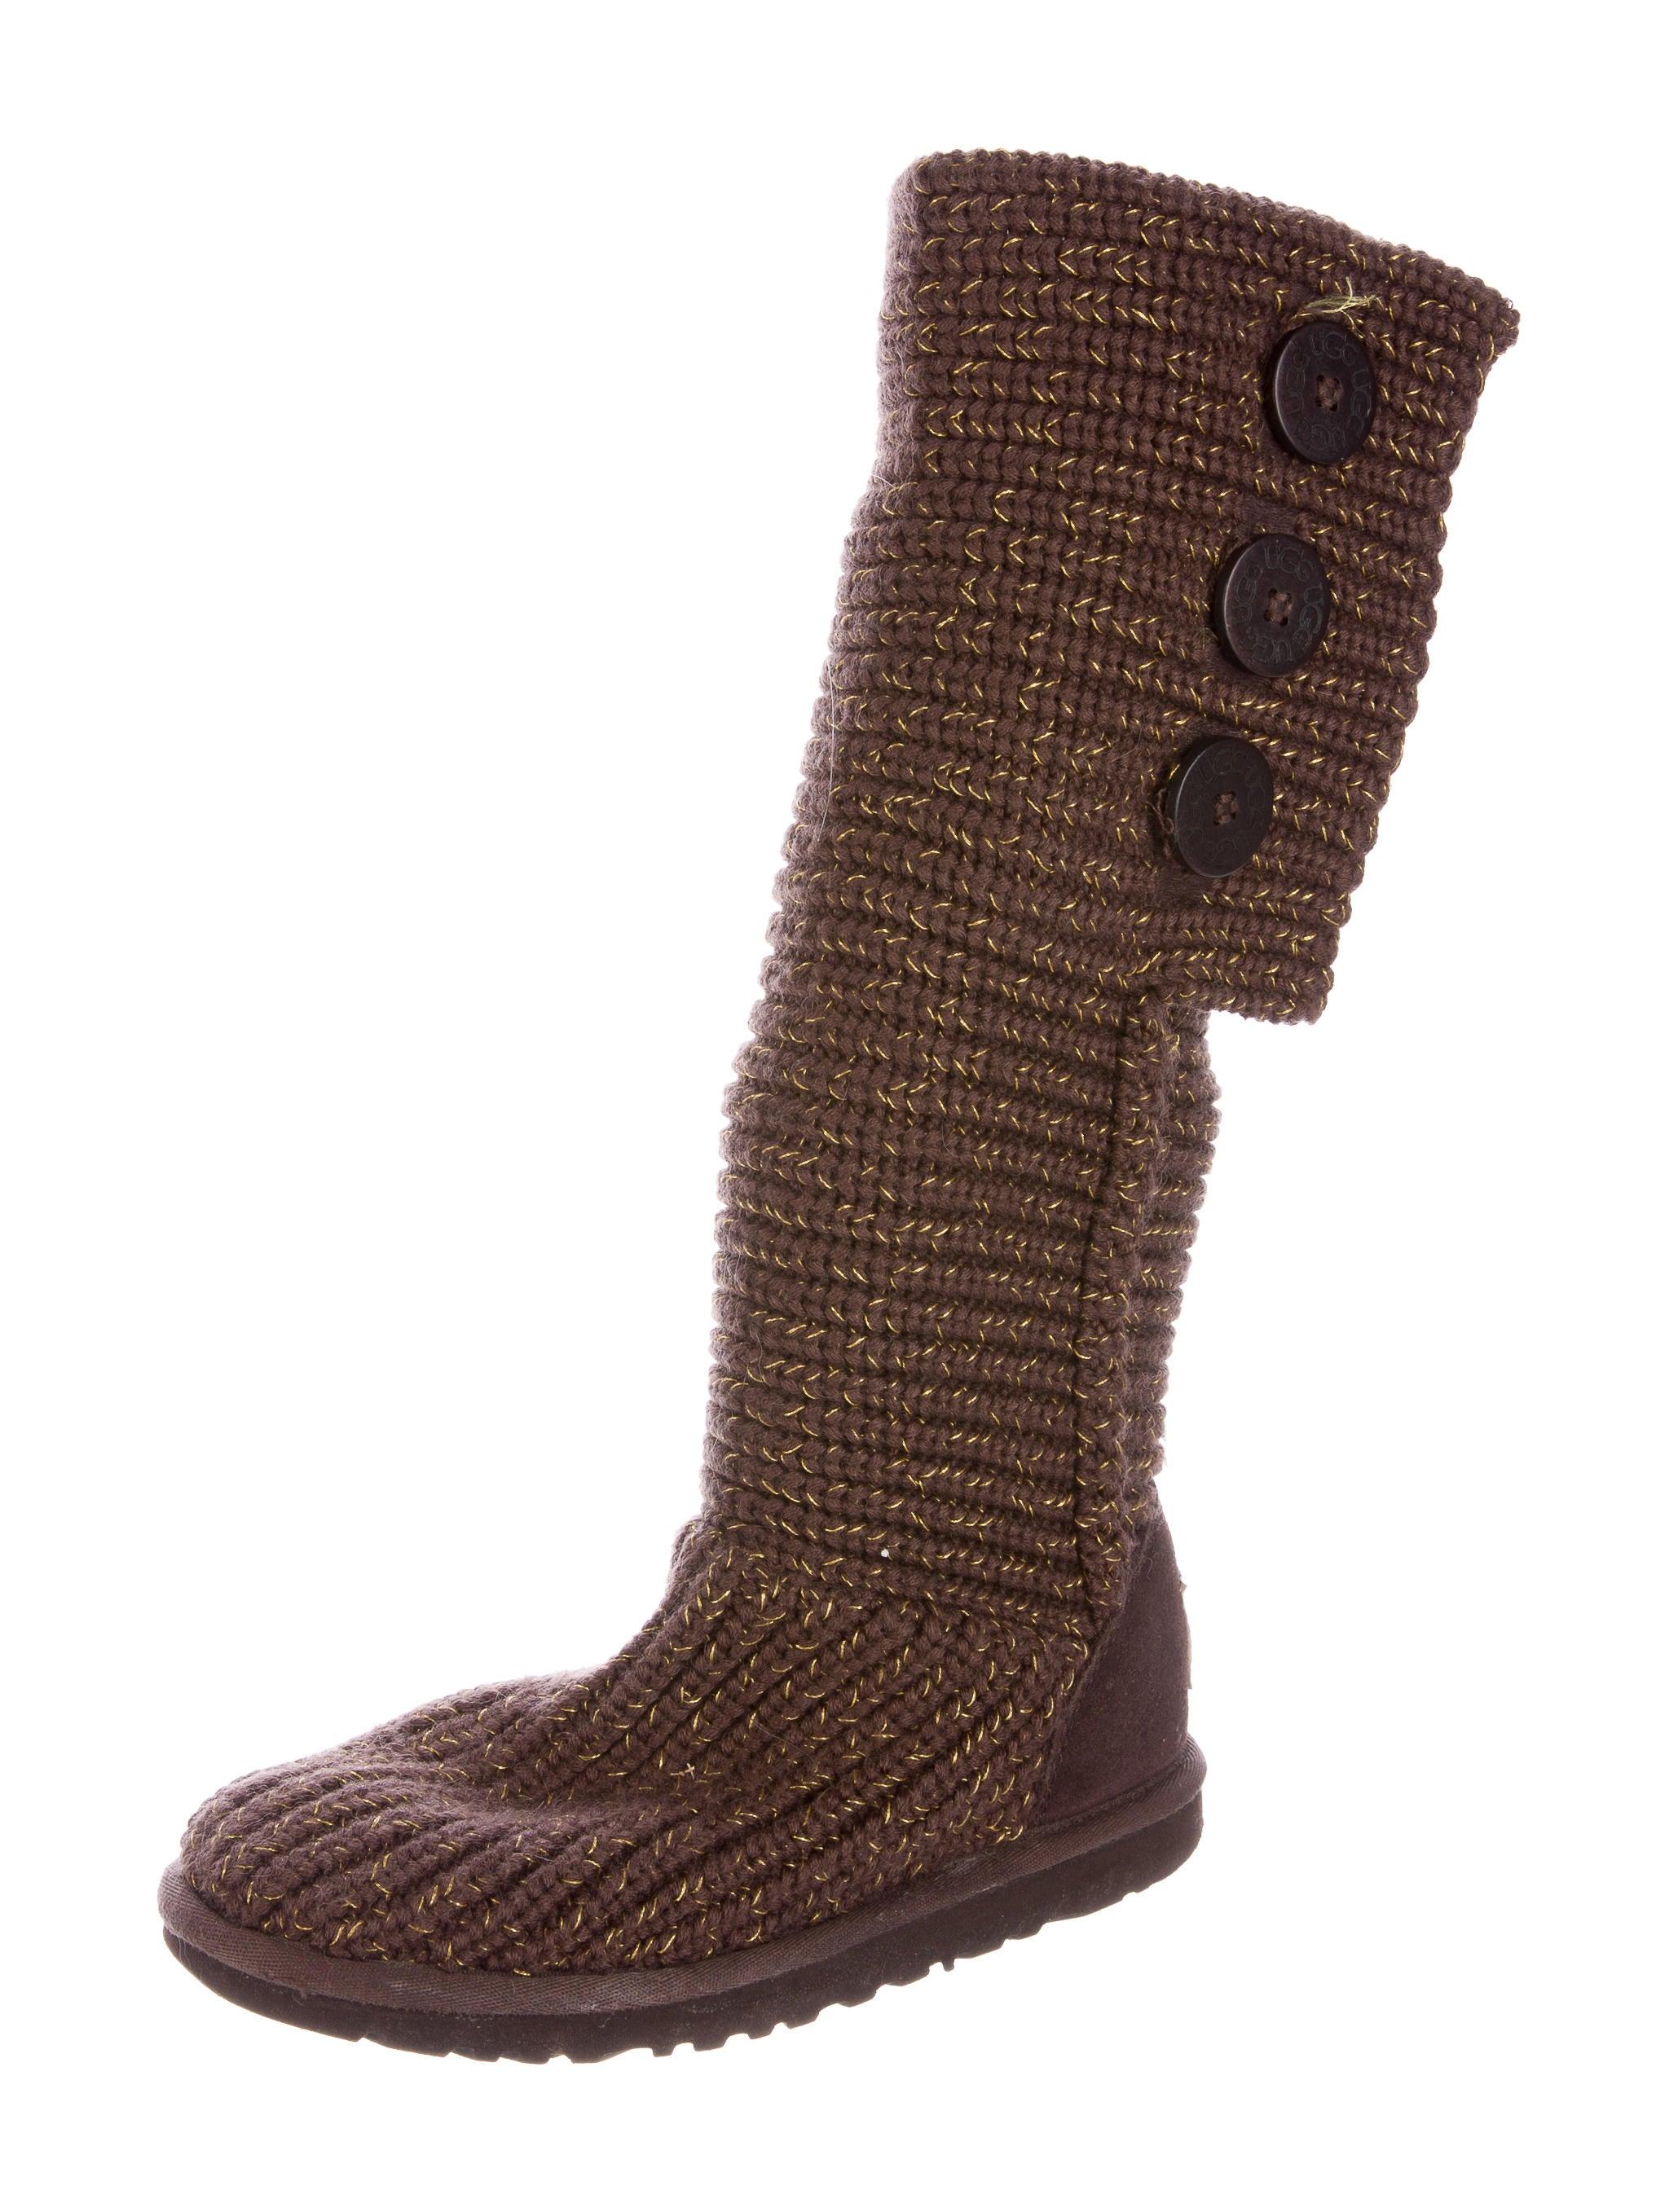 Knitting Websites Australia : Ugg australia cardy knit boots shoes wuugg the